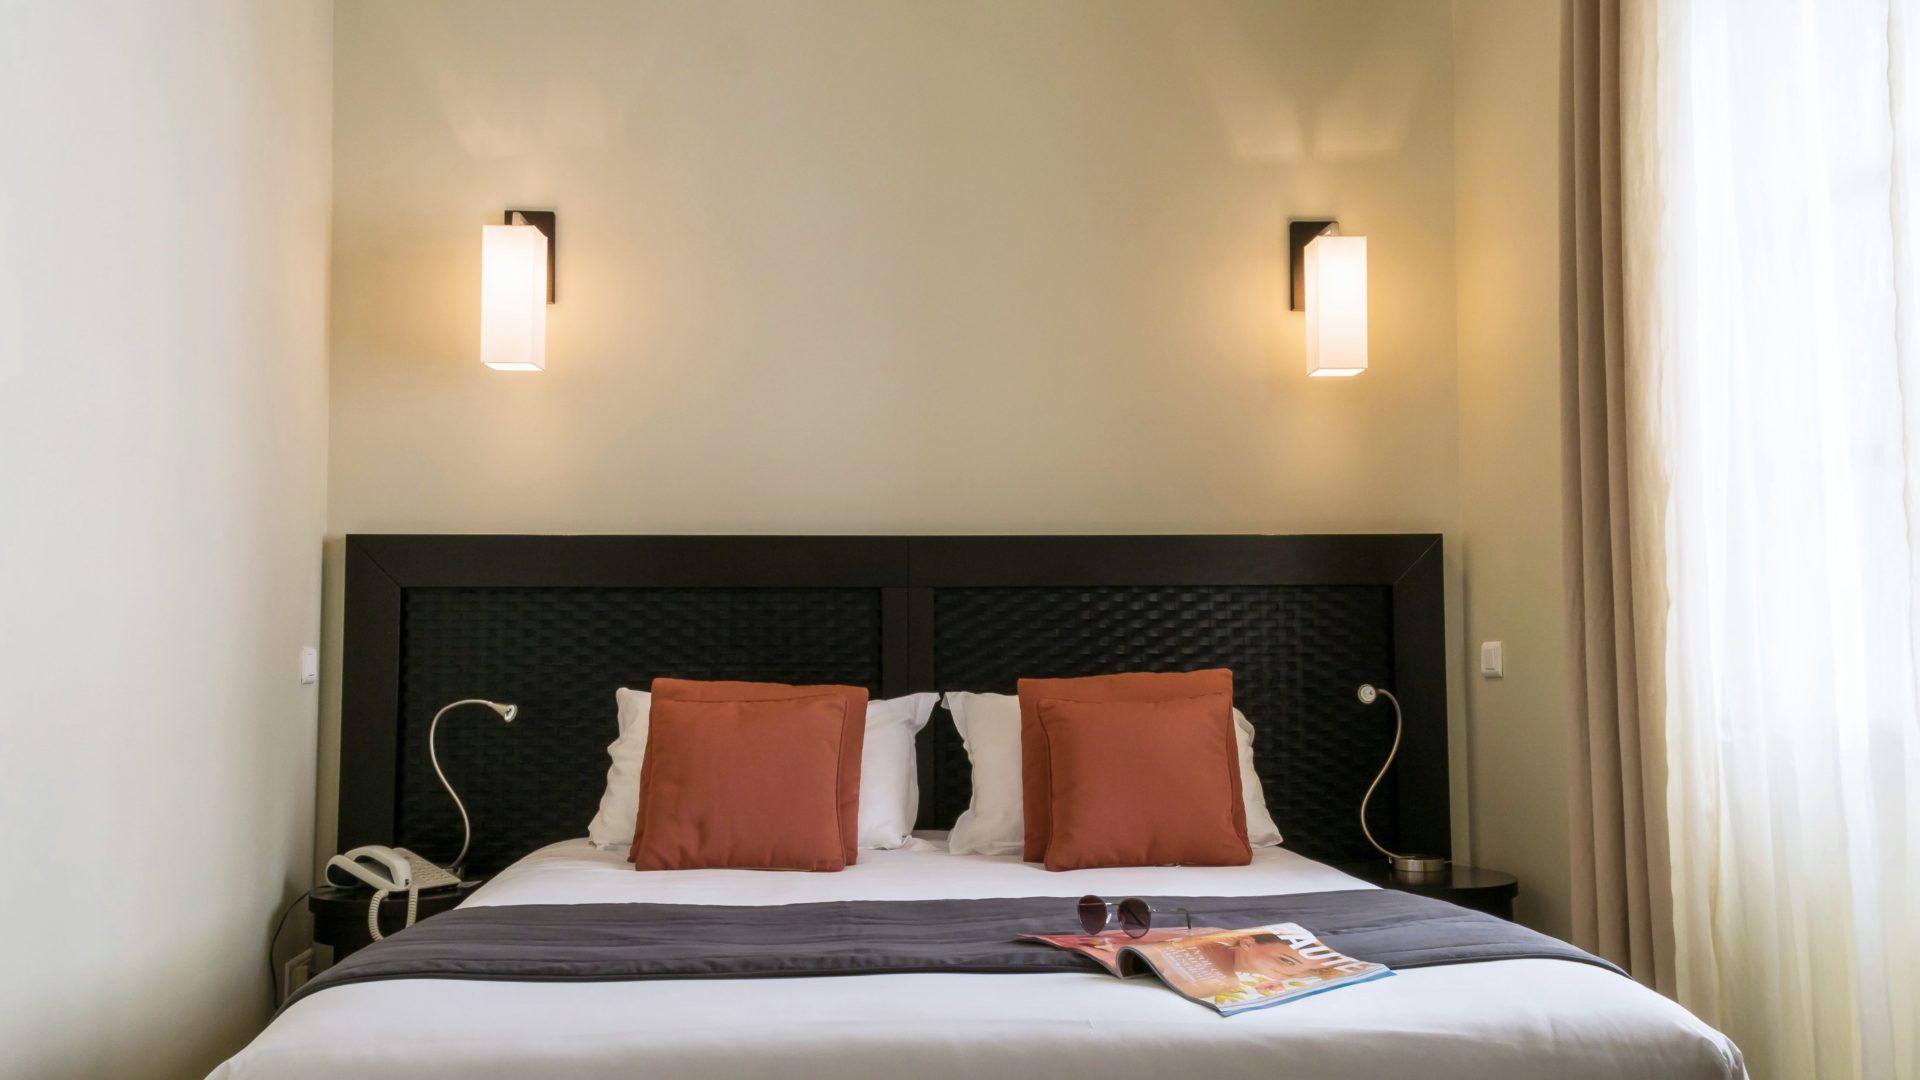 Hotel Perla Rossa Ile Rousse Corsica Frankrijk SkiMaquis OntdekCorsica junior suite tweepersoonsbed